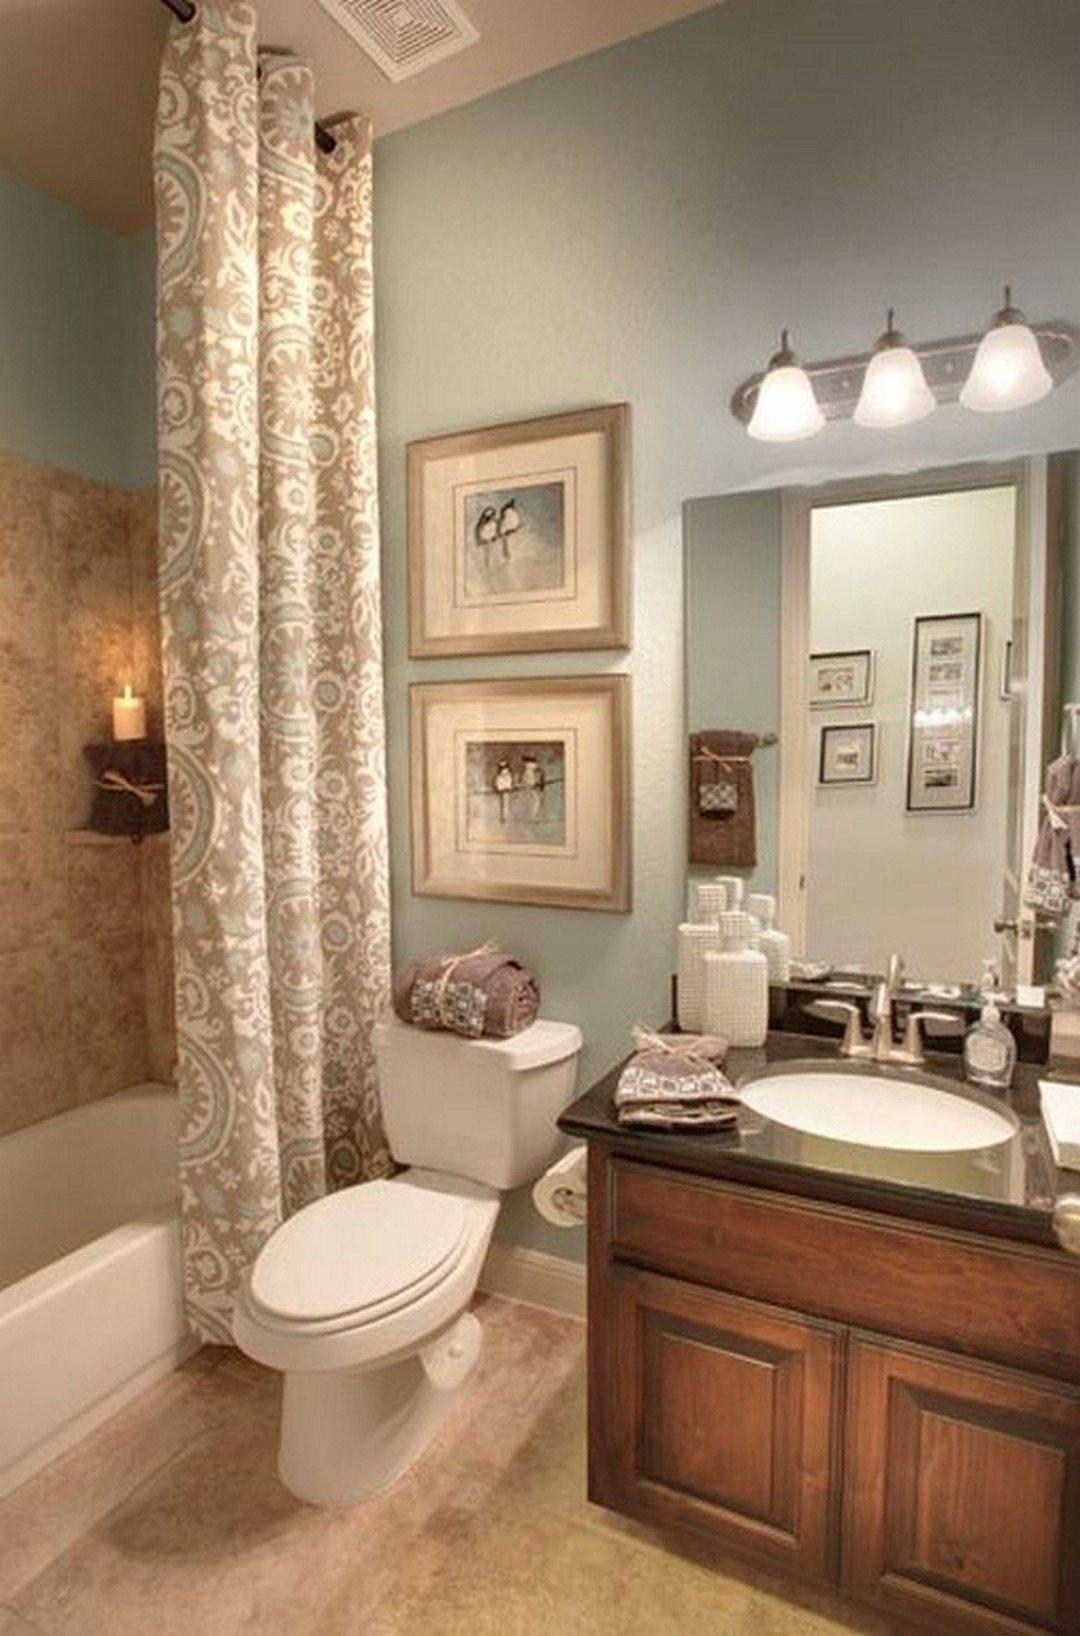 Bathroom Decor On A Budget Best Of Small Master Bathroom Decor A Bud 20 Echitecture